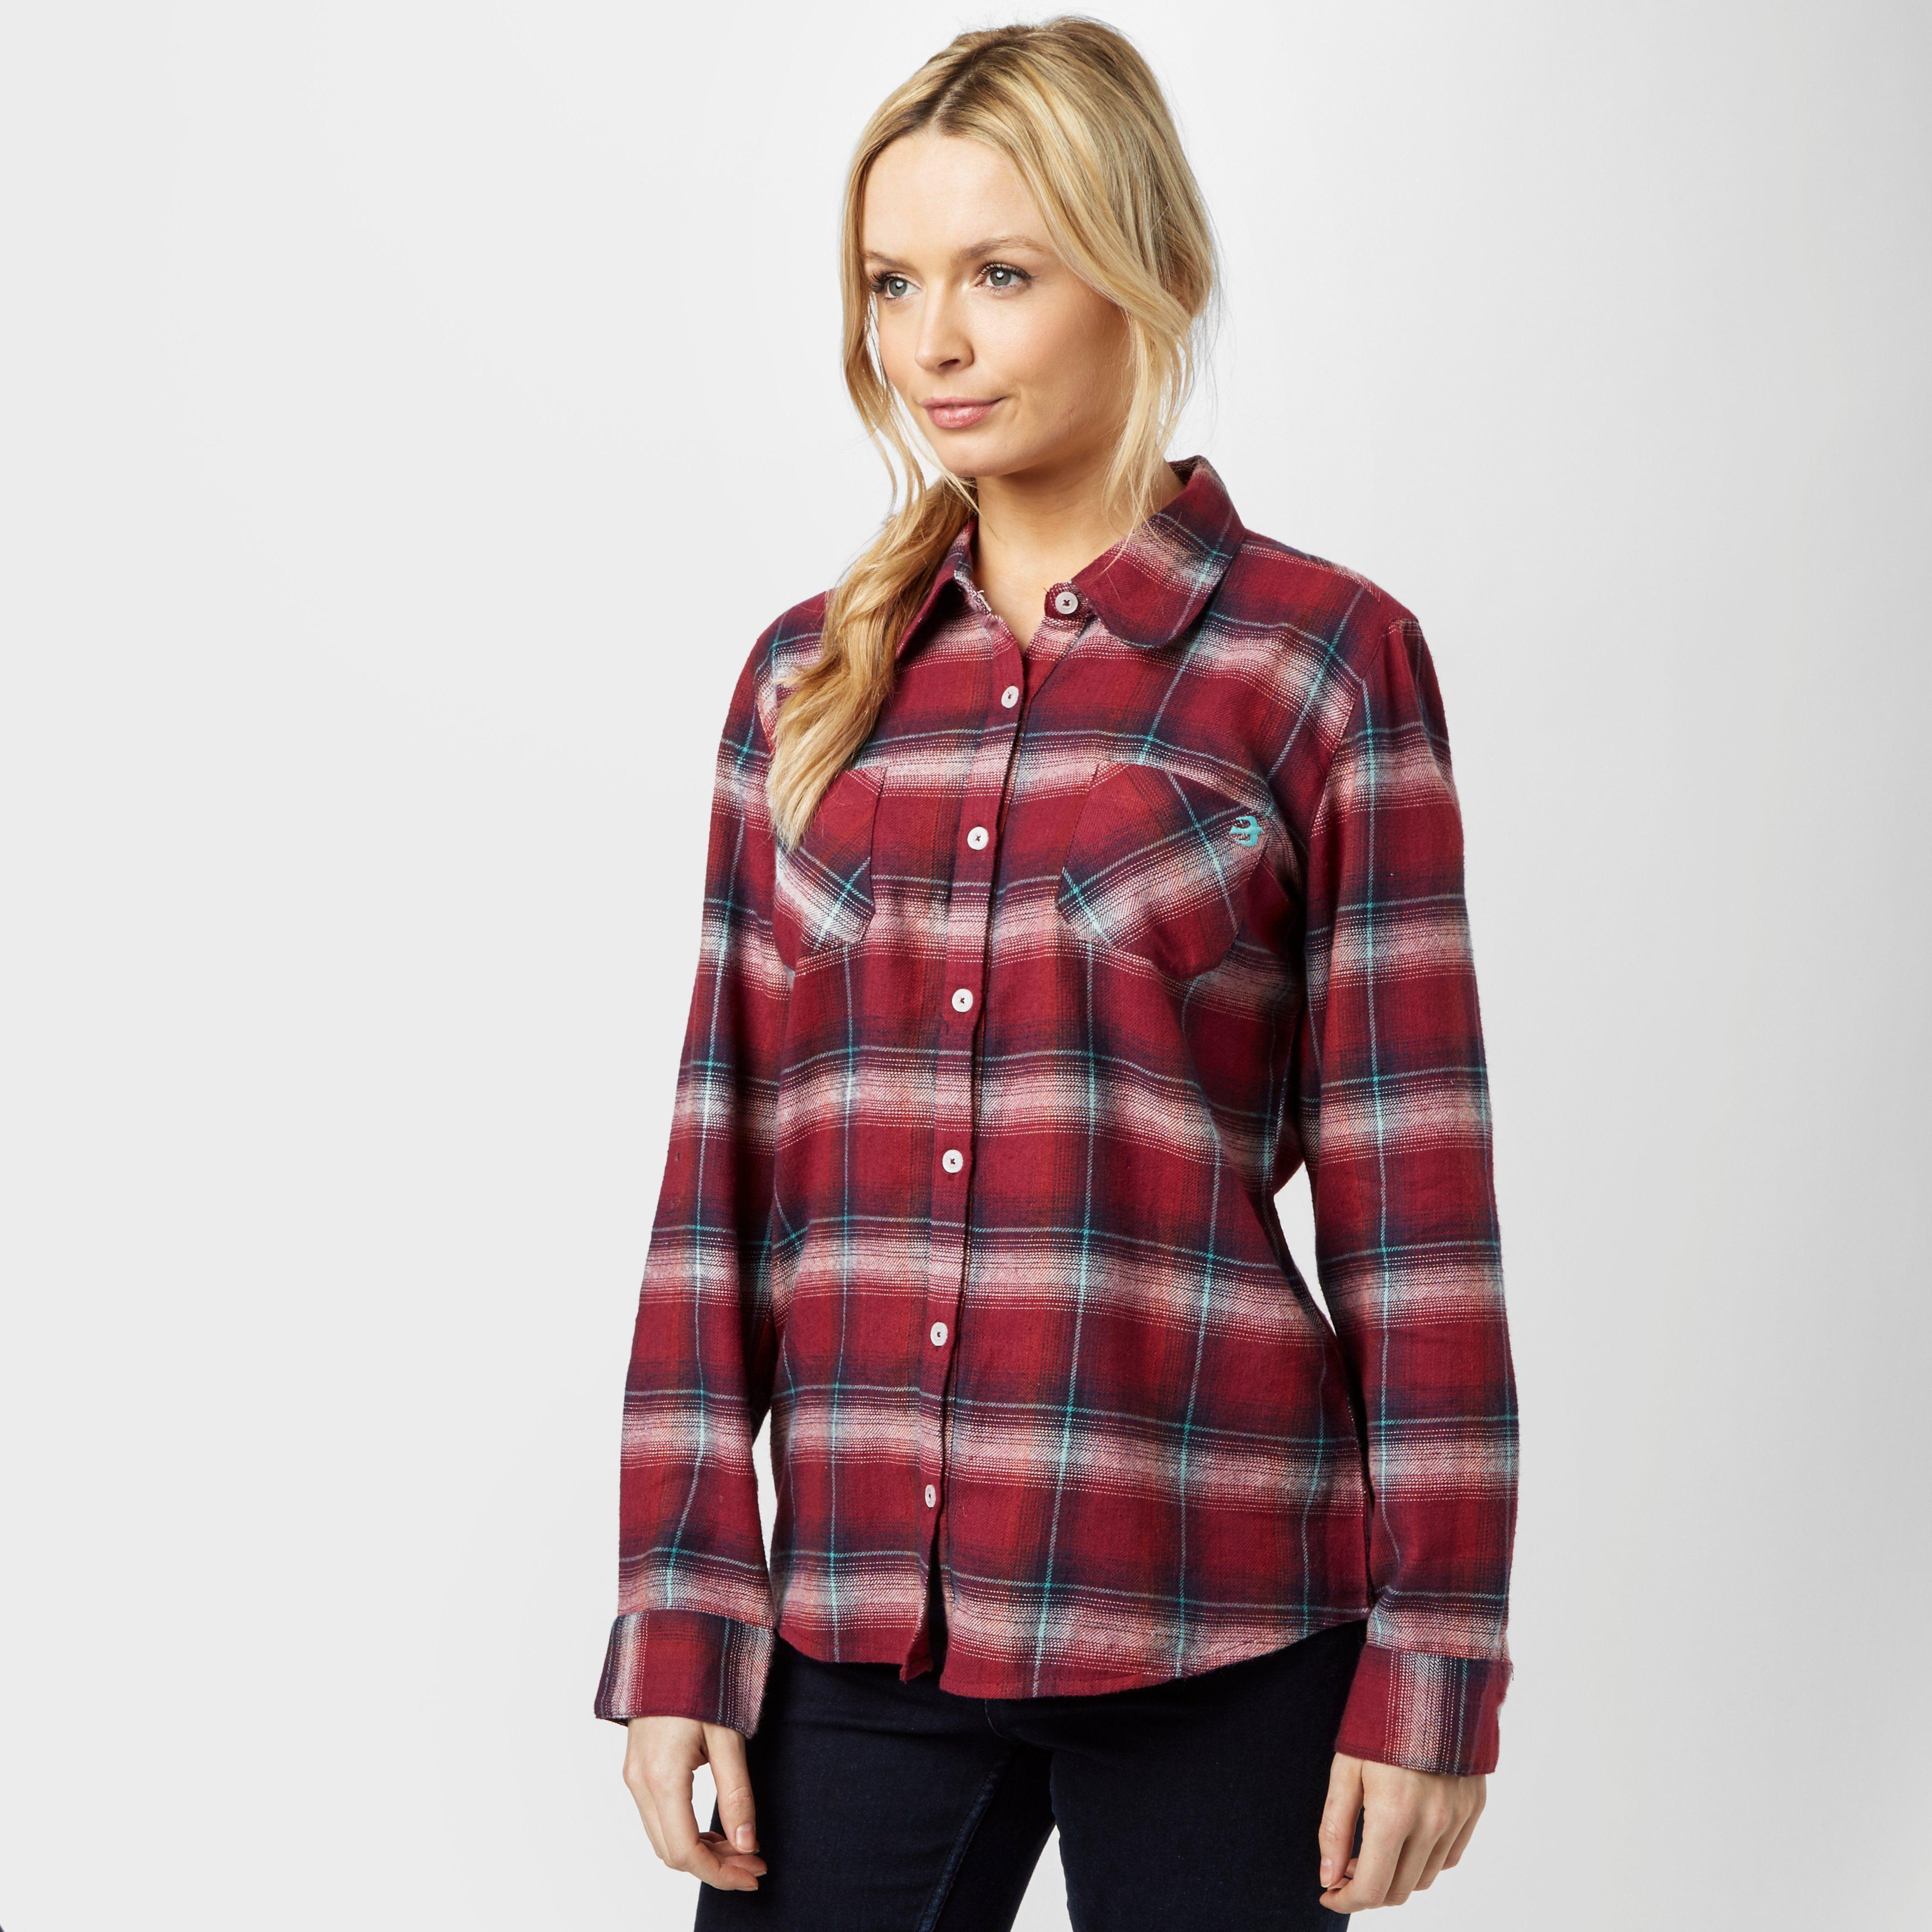 BRAKEBURN Women's Check Flannel Shirt